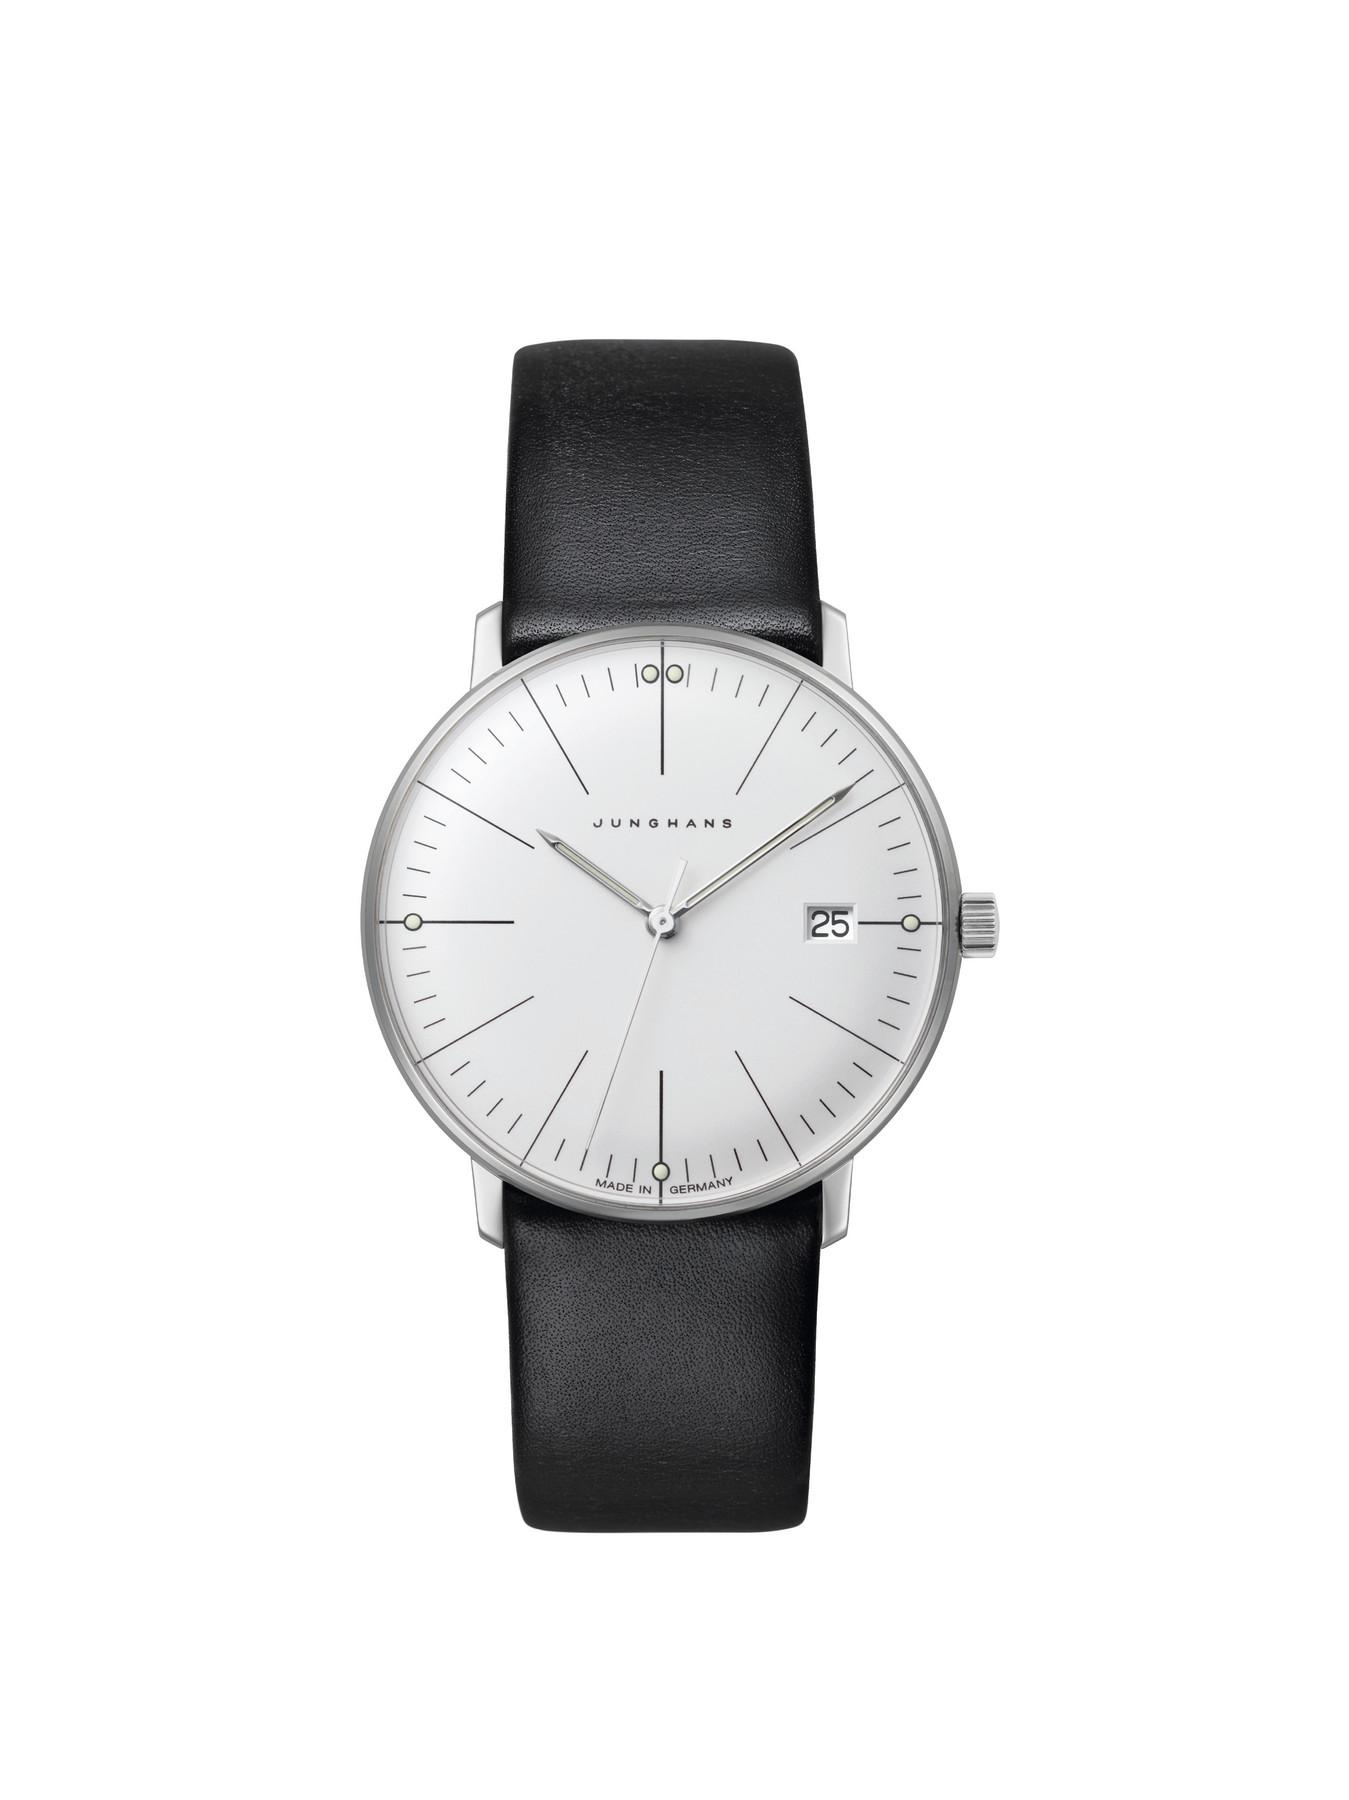 Junghans max bill Damen Armbanduhr 047/4251.02 | 474251.02 mit Saphirglas